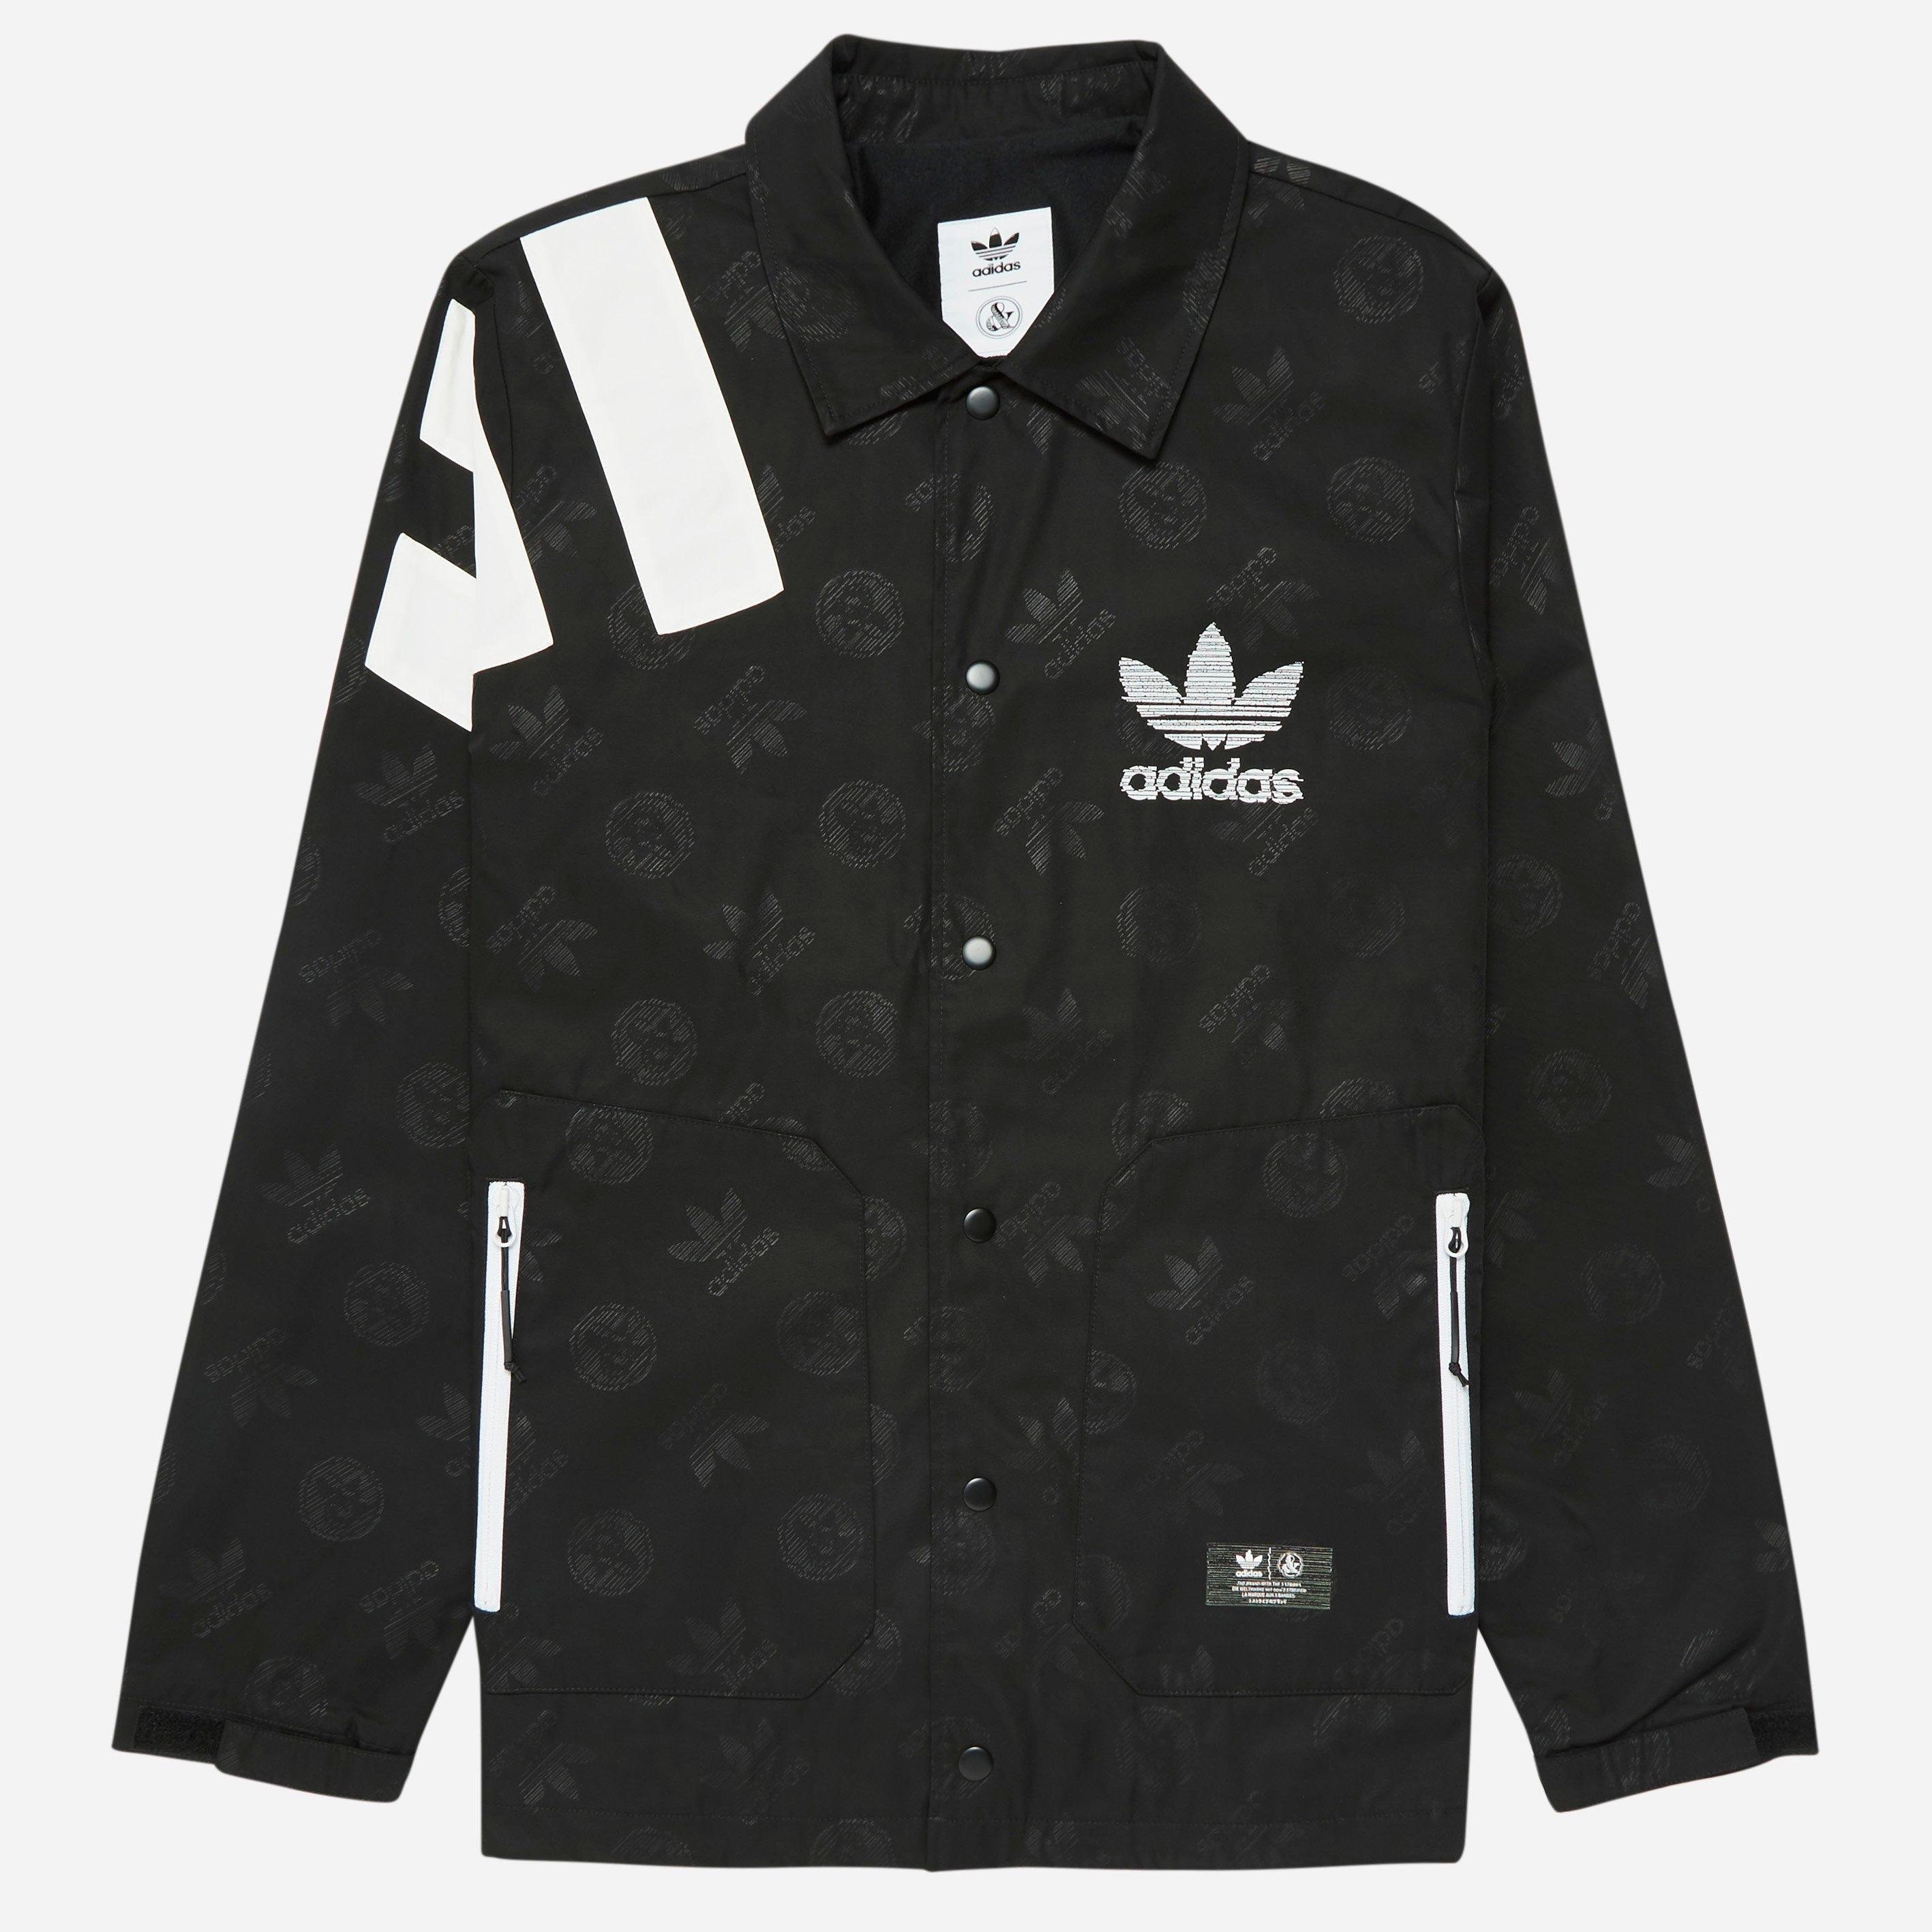 adidas Originals X United Arrows & Sons Game Jacket